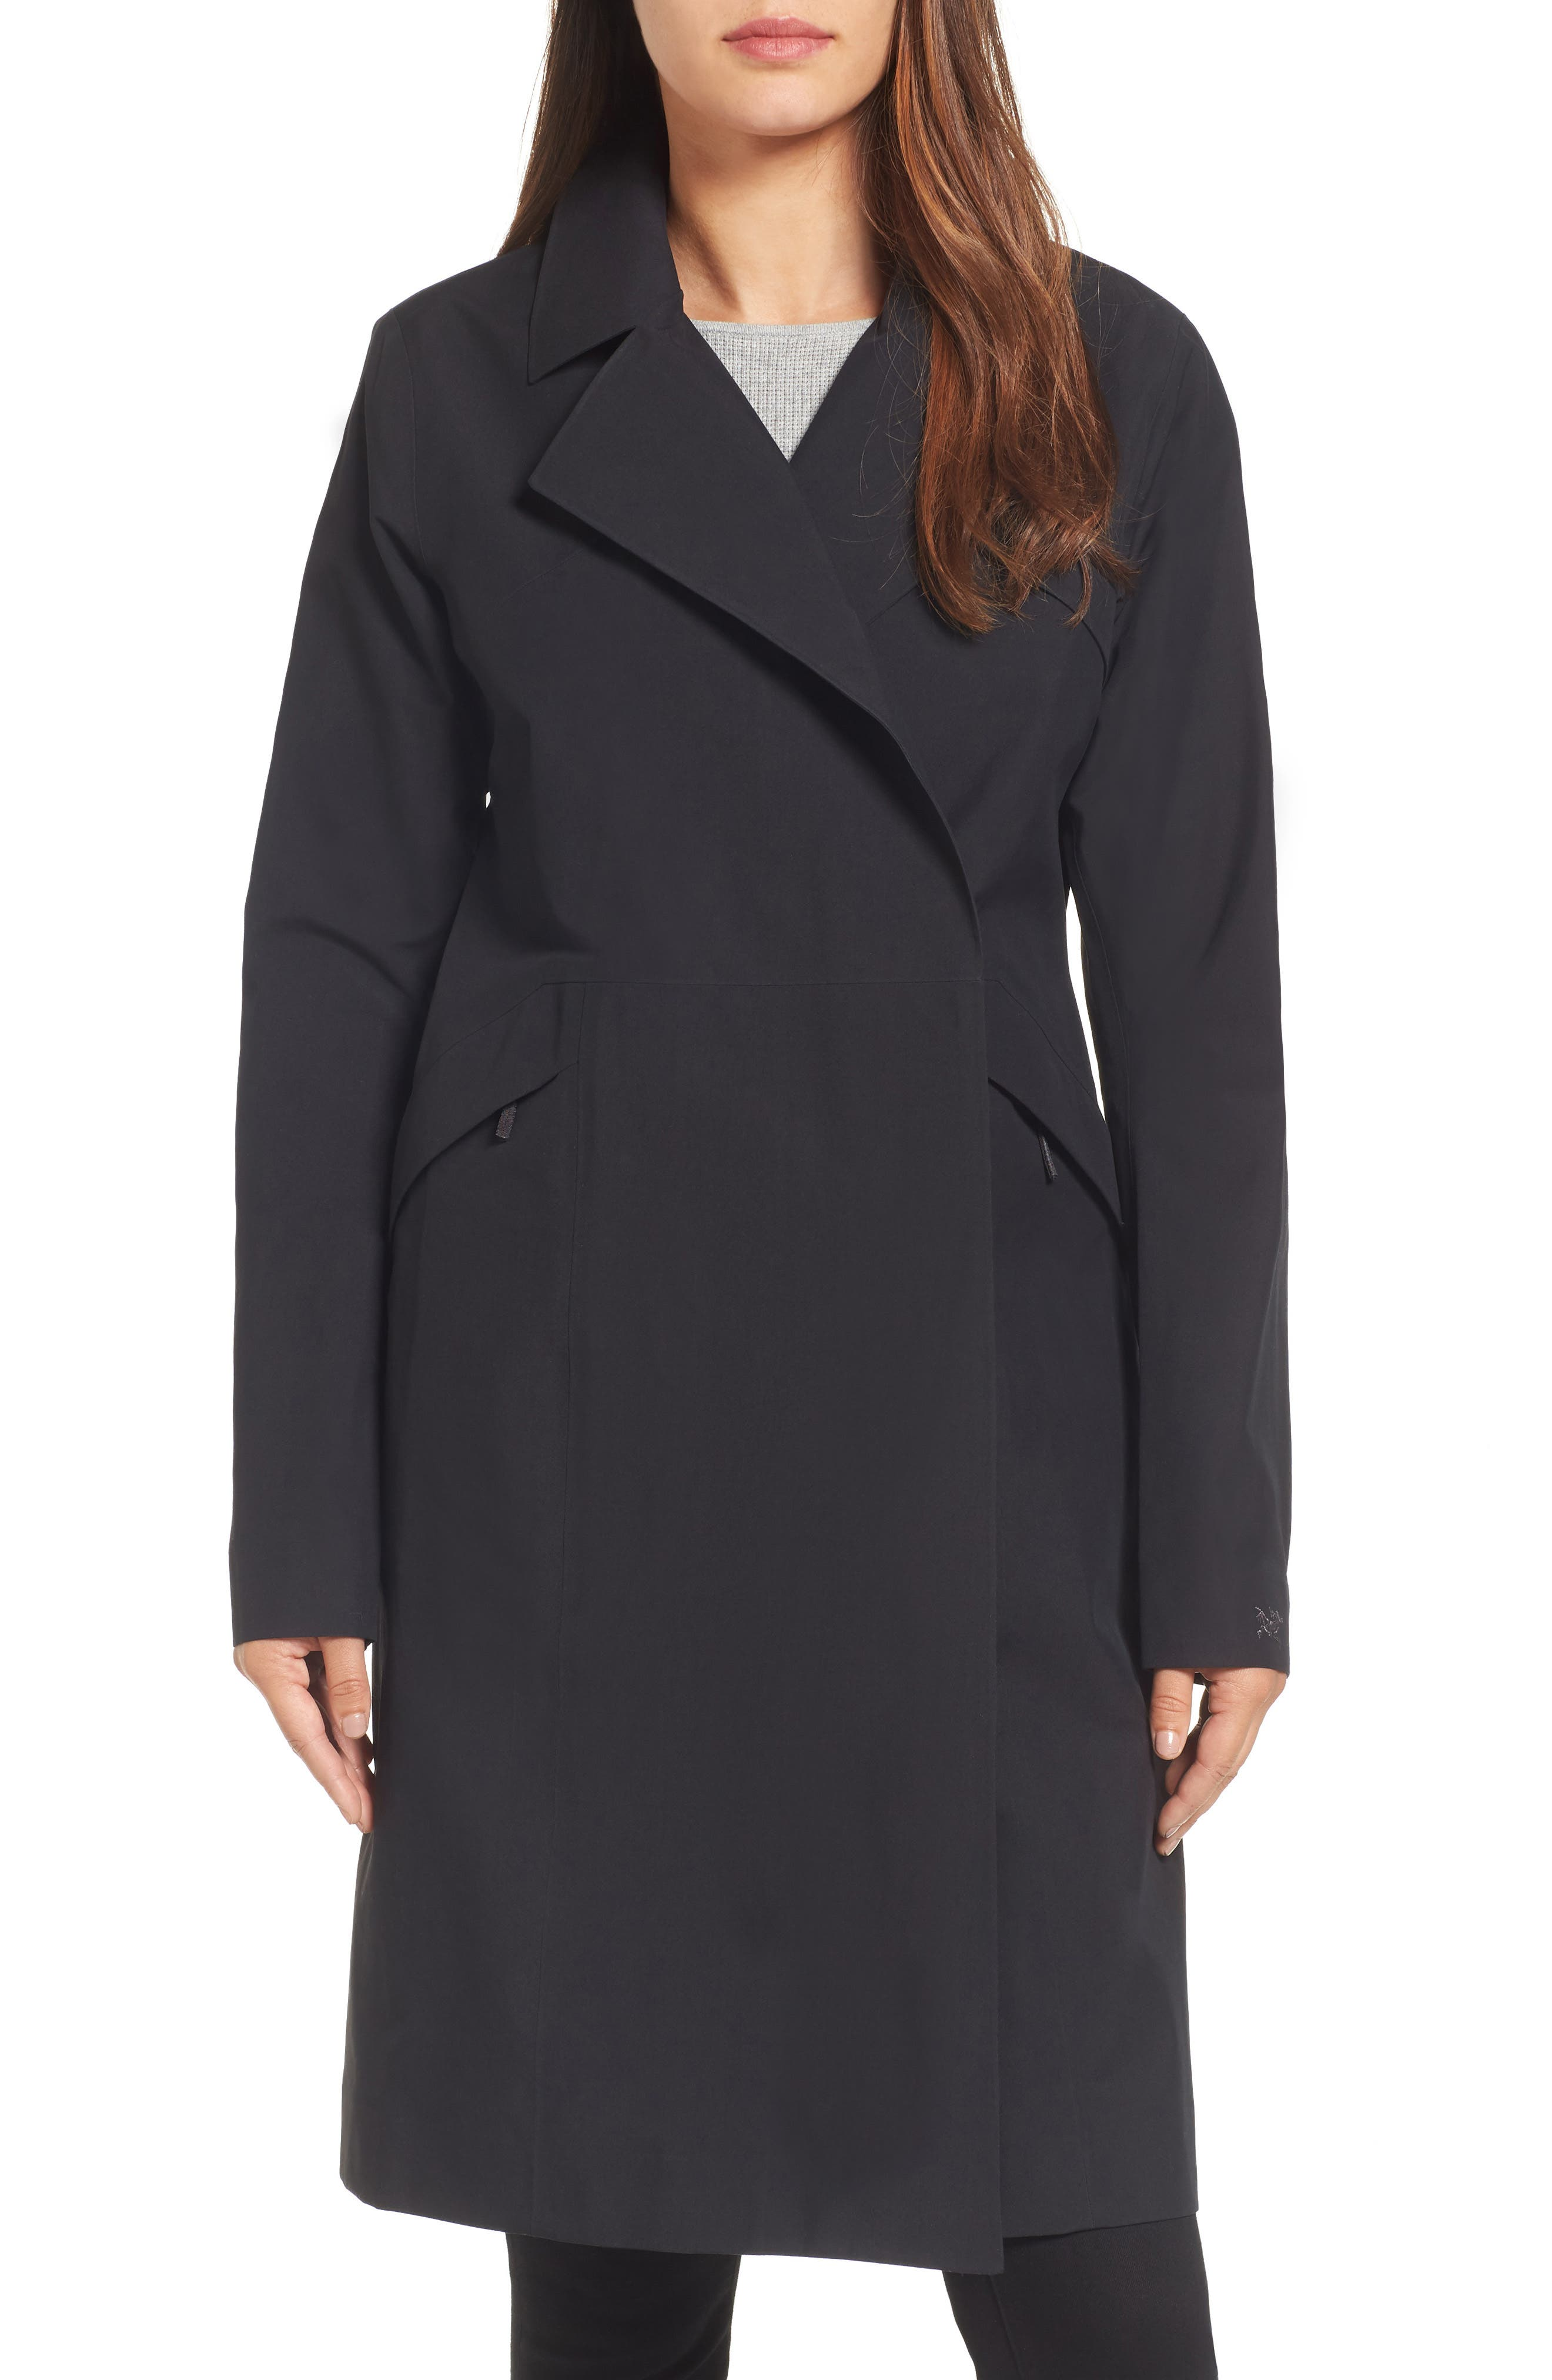 Nila Gore-Tex<sup>®</sup> Trench Coat,                         Main,                         color,